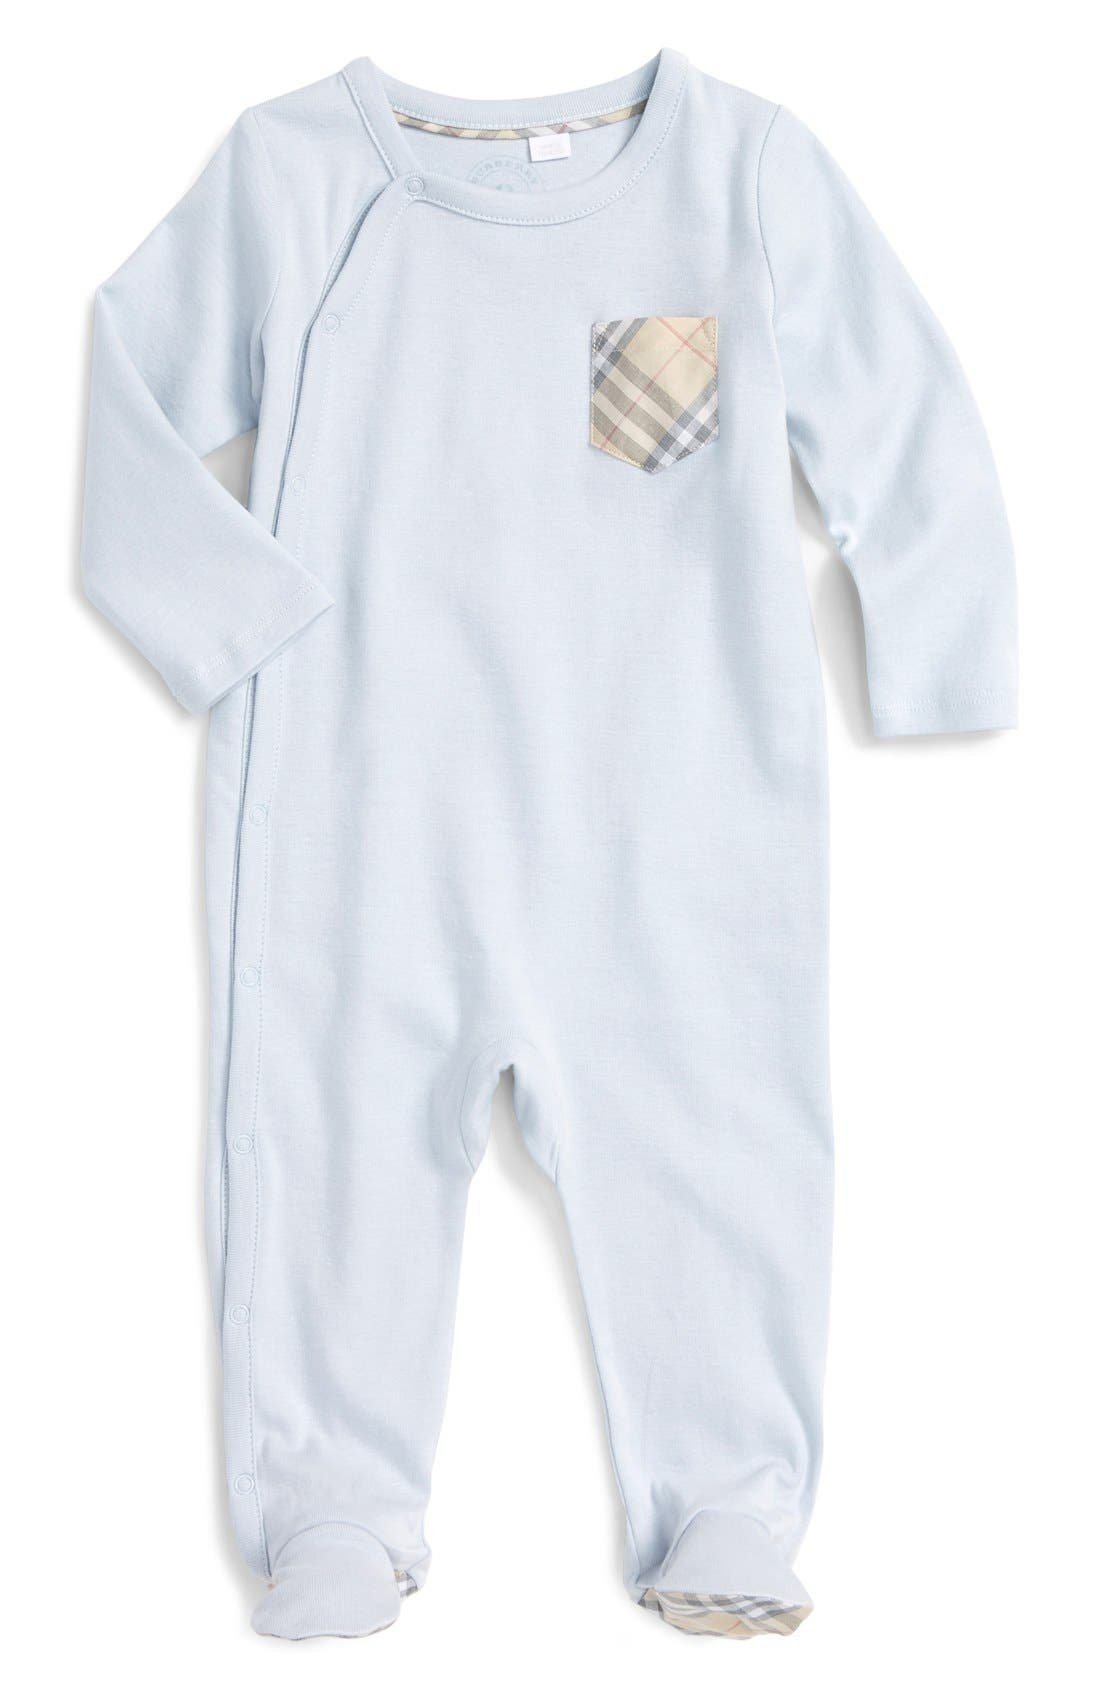 Main Image - Burberry 'Jaydin' Check Trim Cotton Footie (Baby Boys)